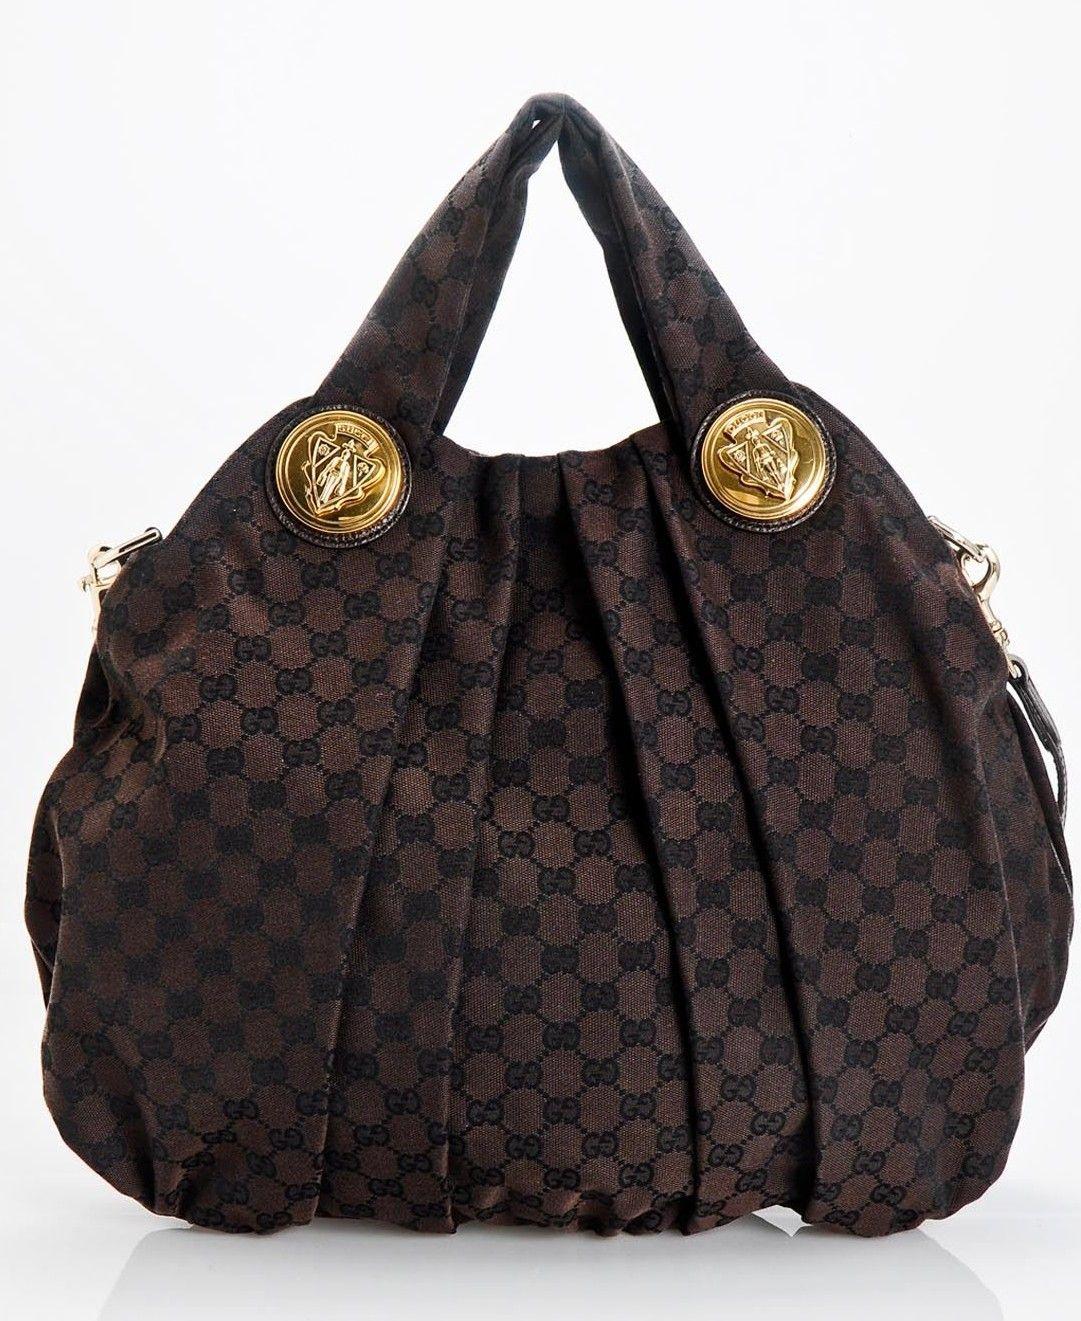 85d9a630e108 Gucci Monogram GG Logo Tote Bag ♥✤